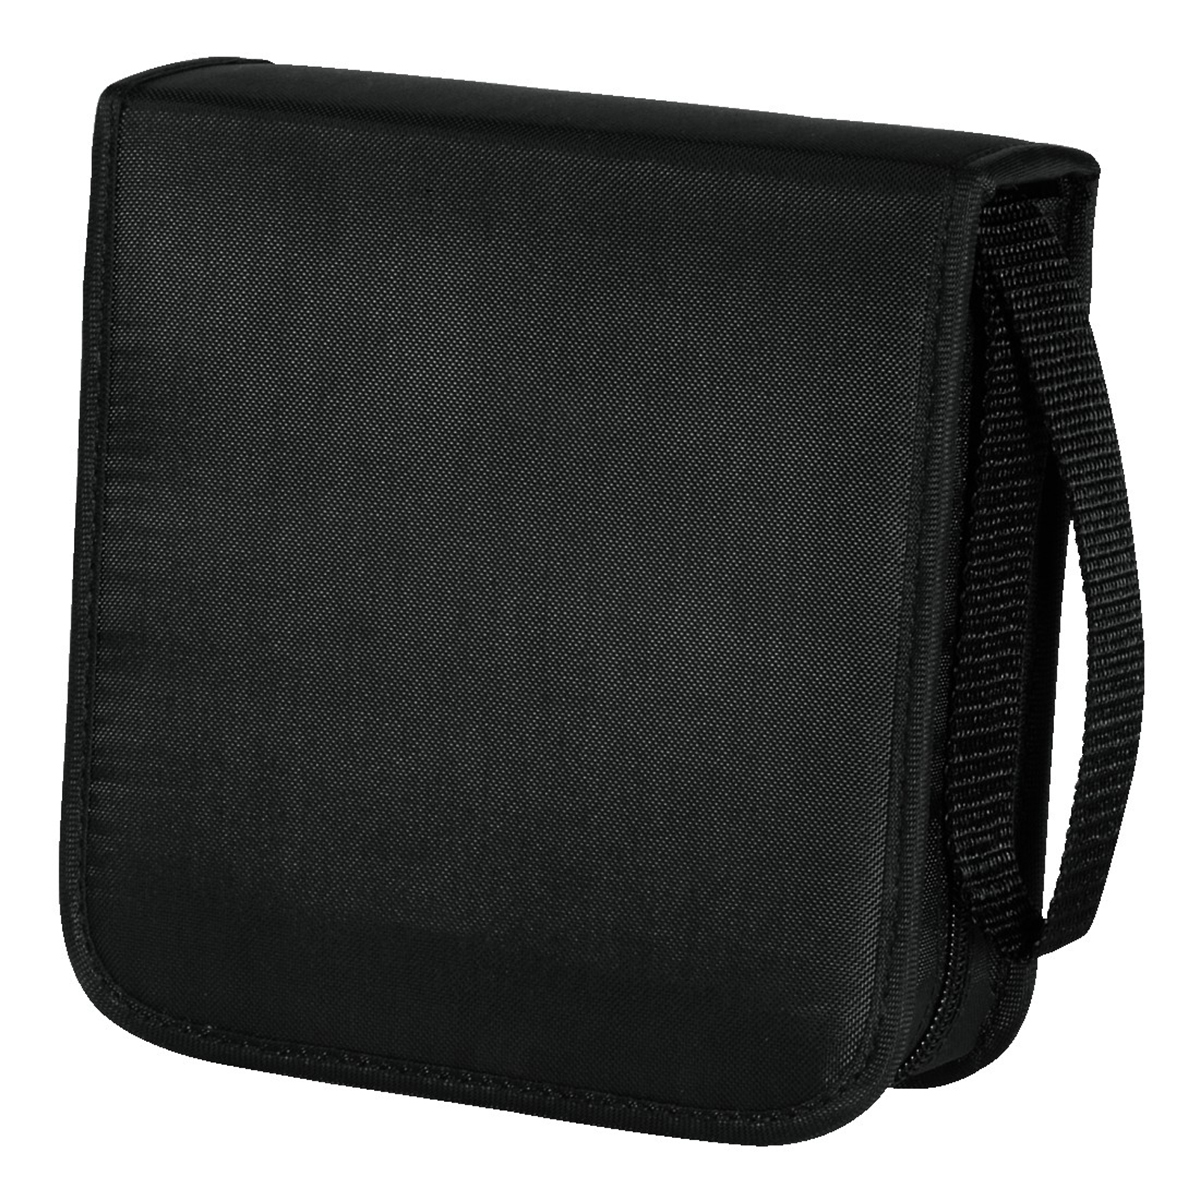 Hama CD Wallet Nylon 40, black 50 discs